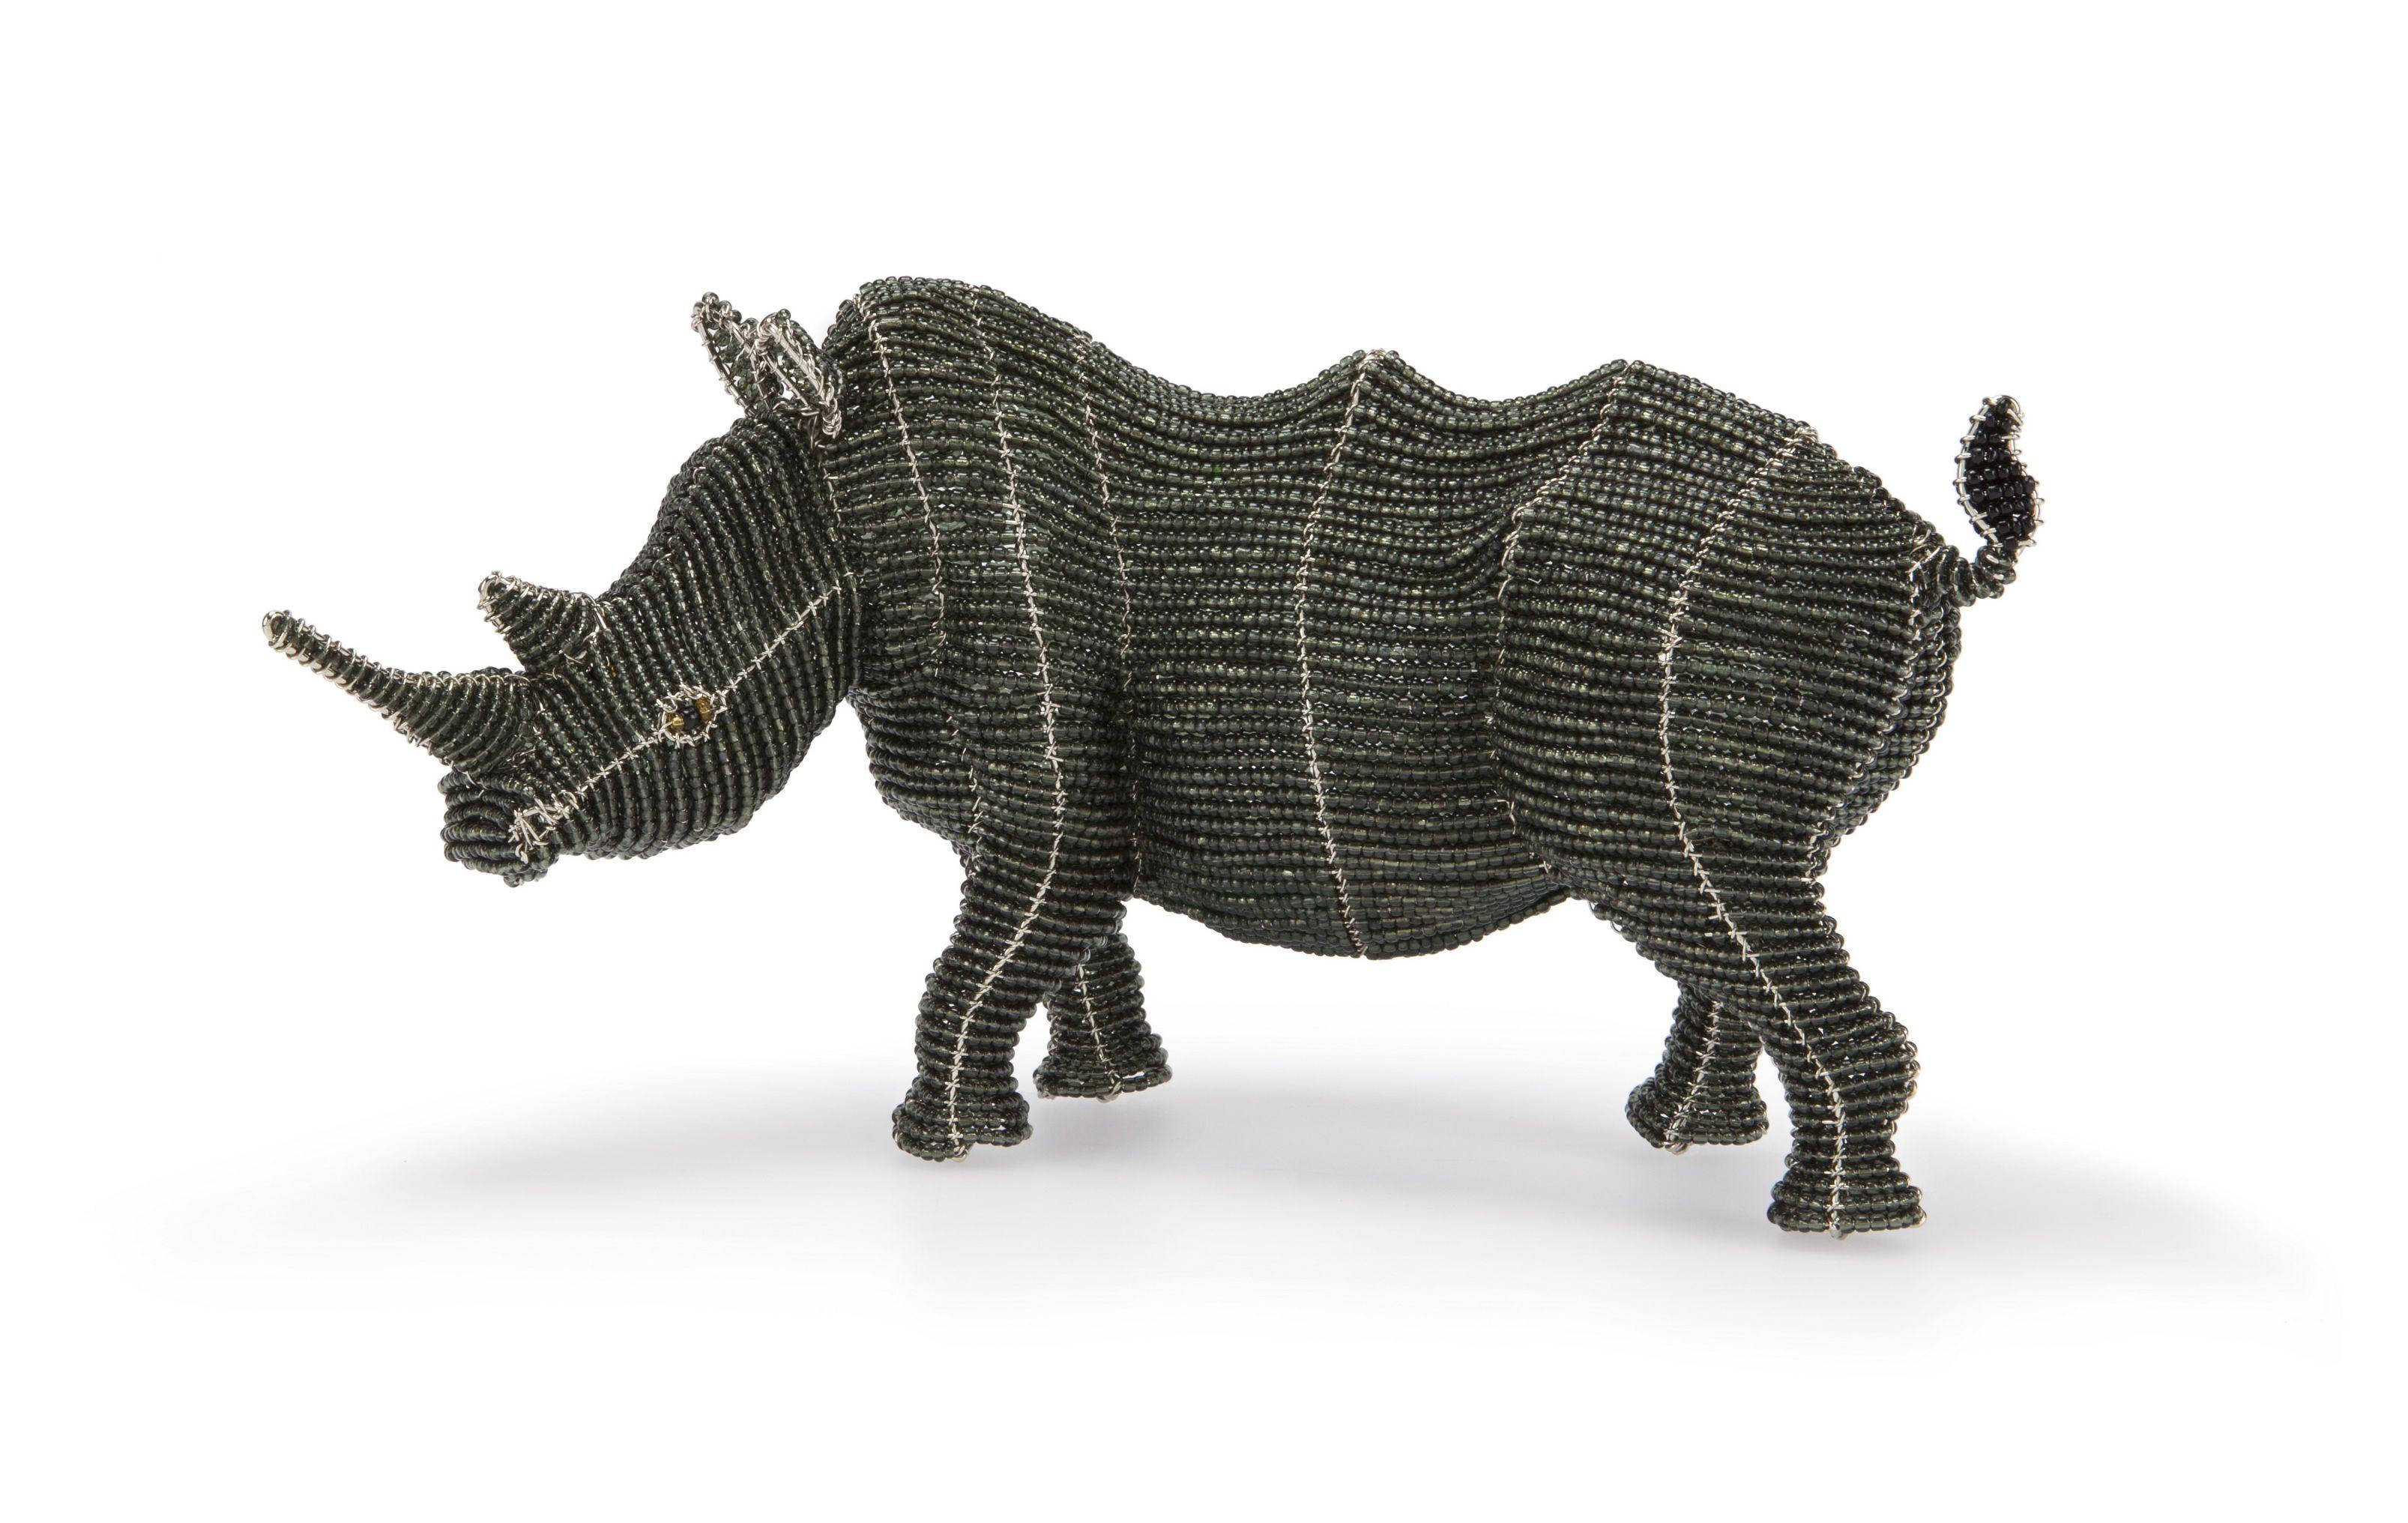 Rhino Figurine | Wire and Bead Art | African Creative | OKC ...